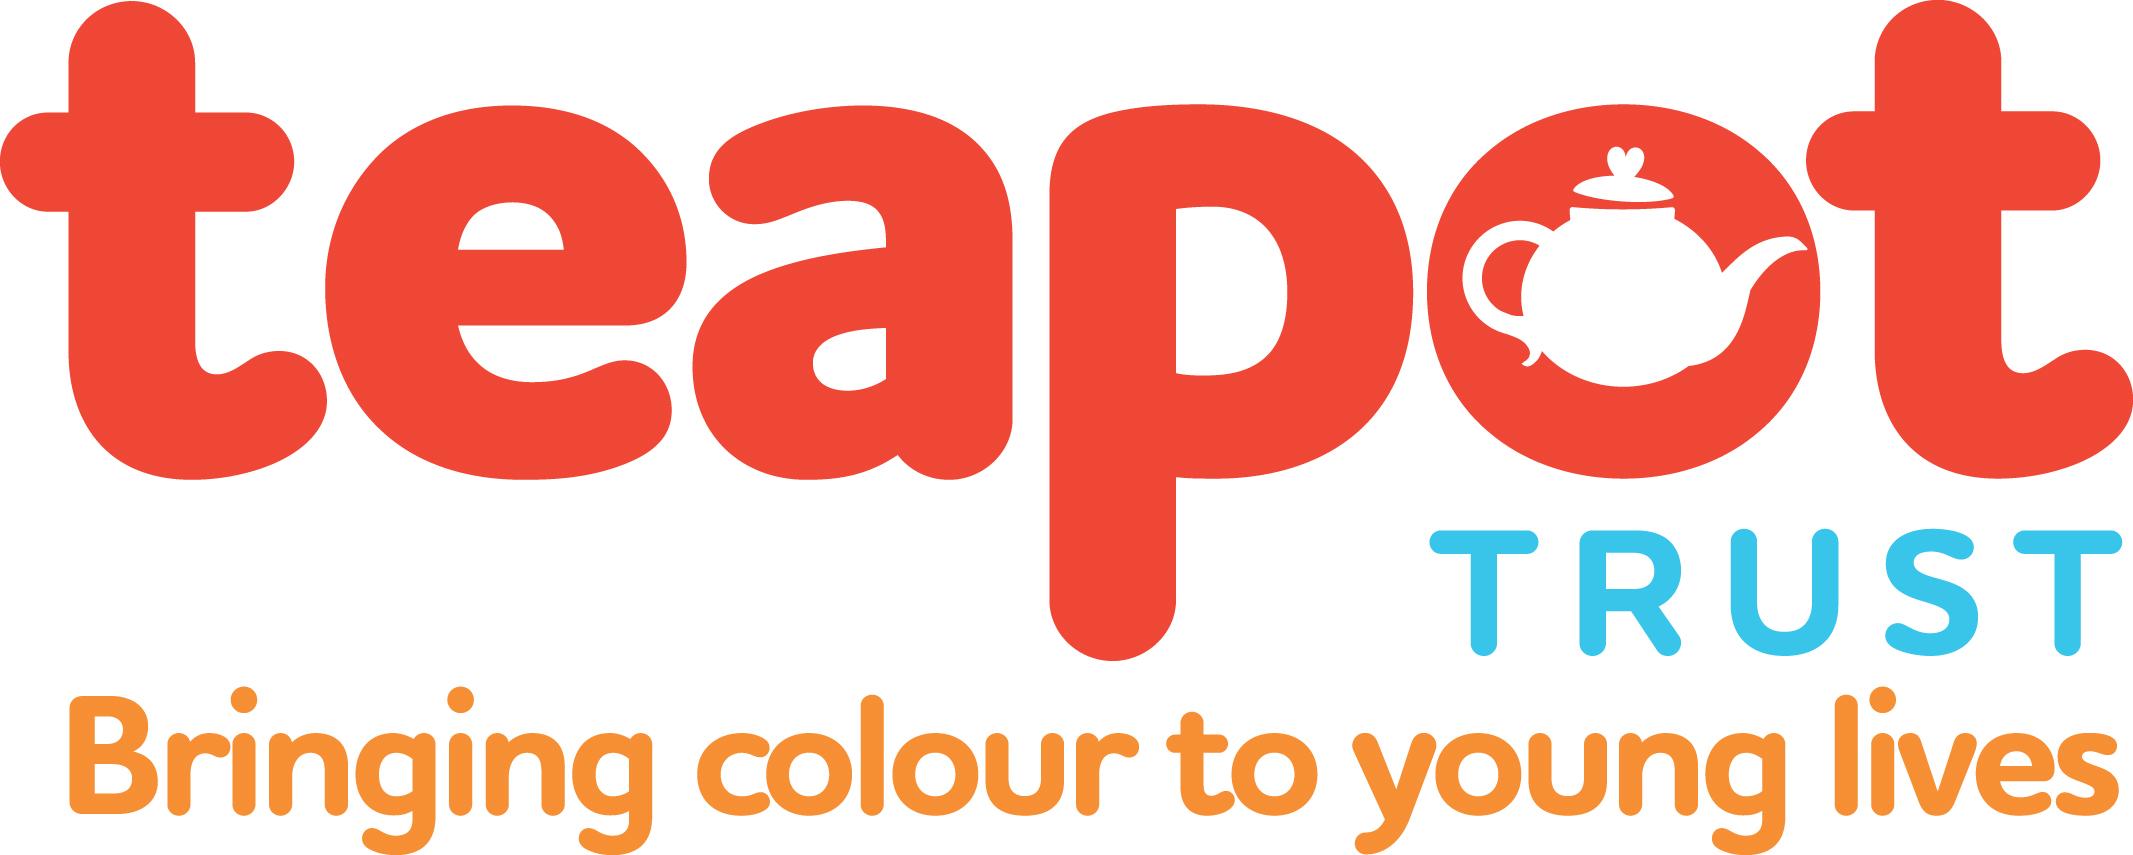 The Teapot Trust members logo